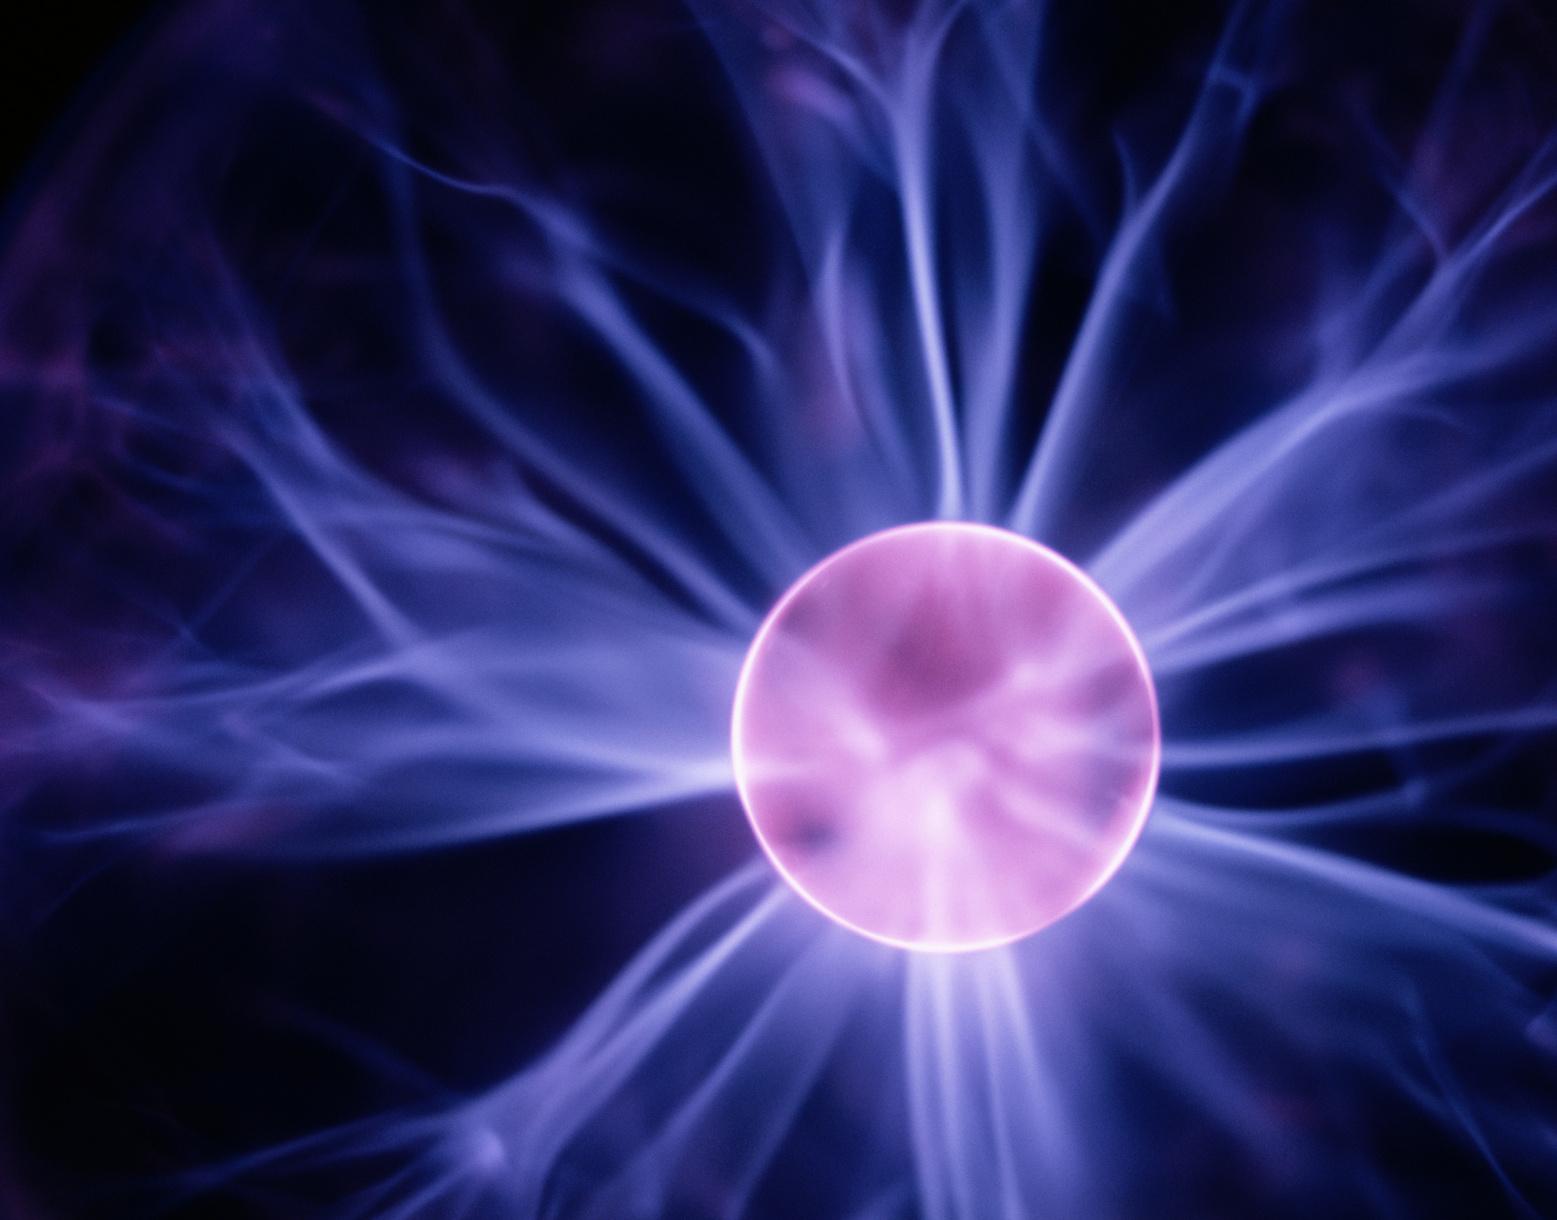 Purple Iphone 5 Wallpaper Lenr Research News Nickel Hydrogen Energy